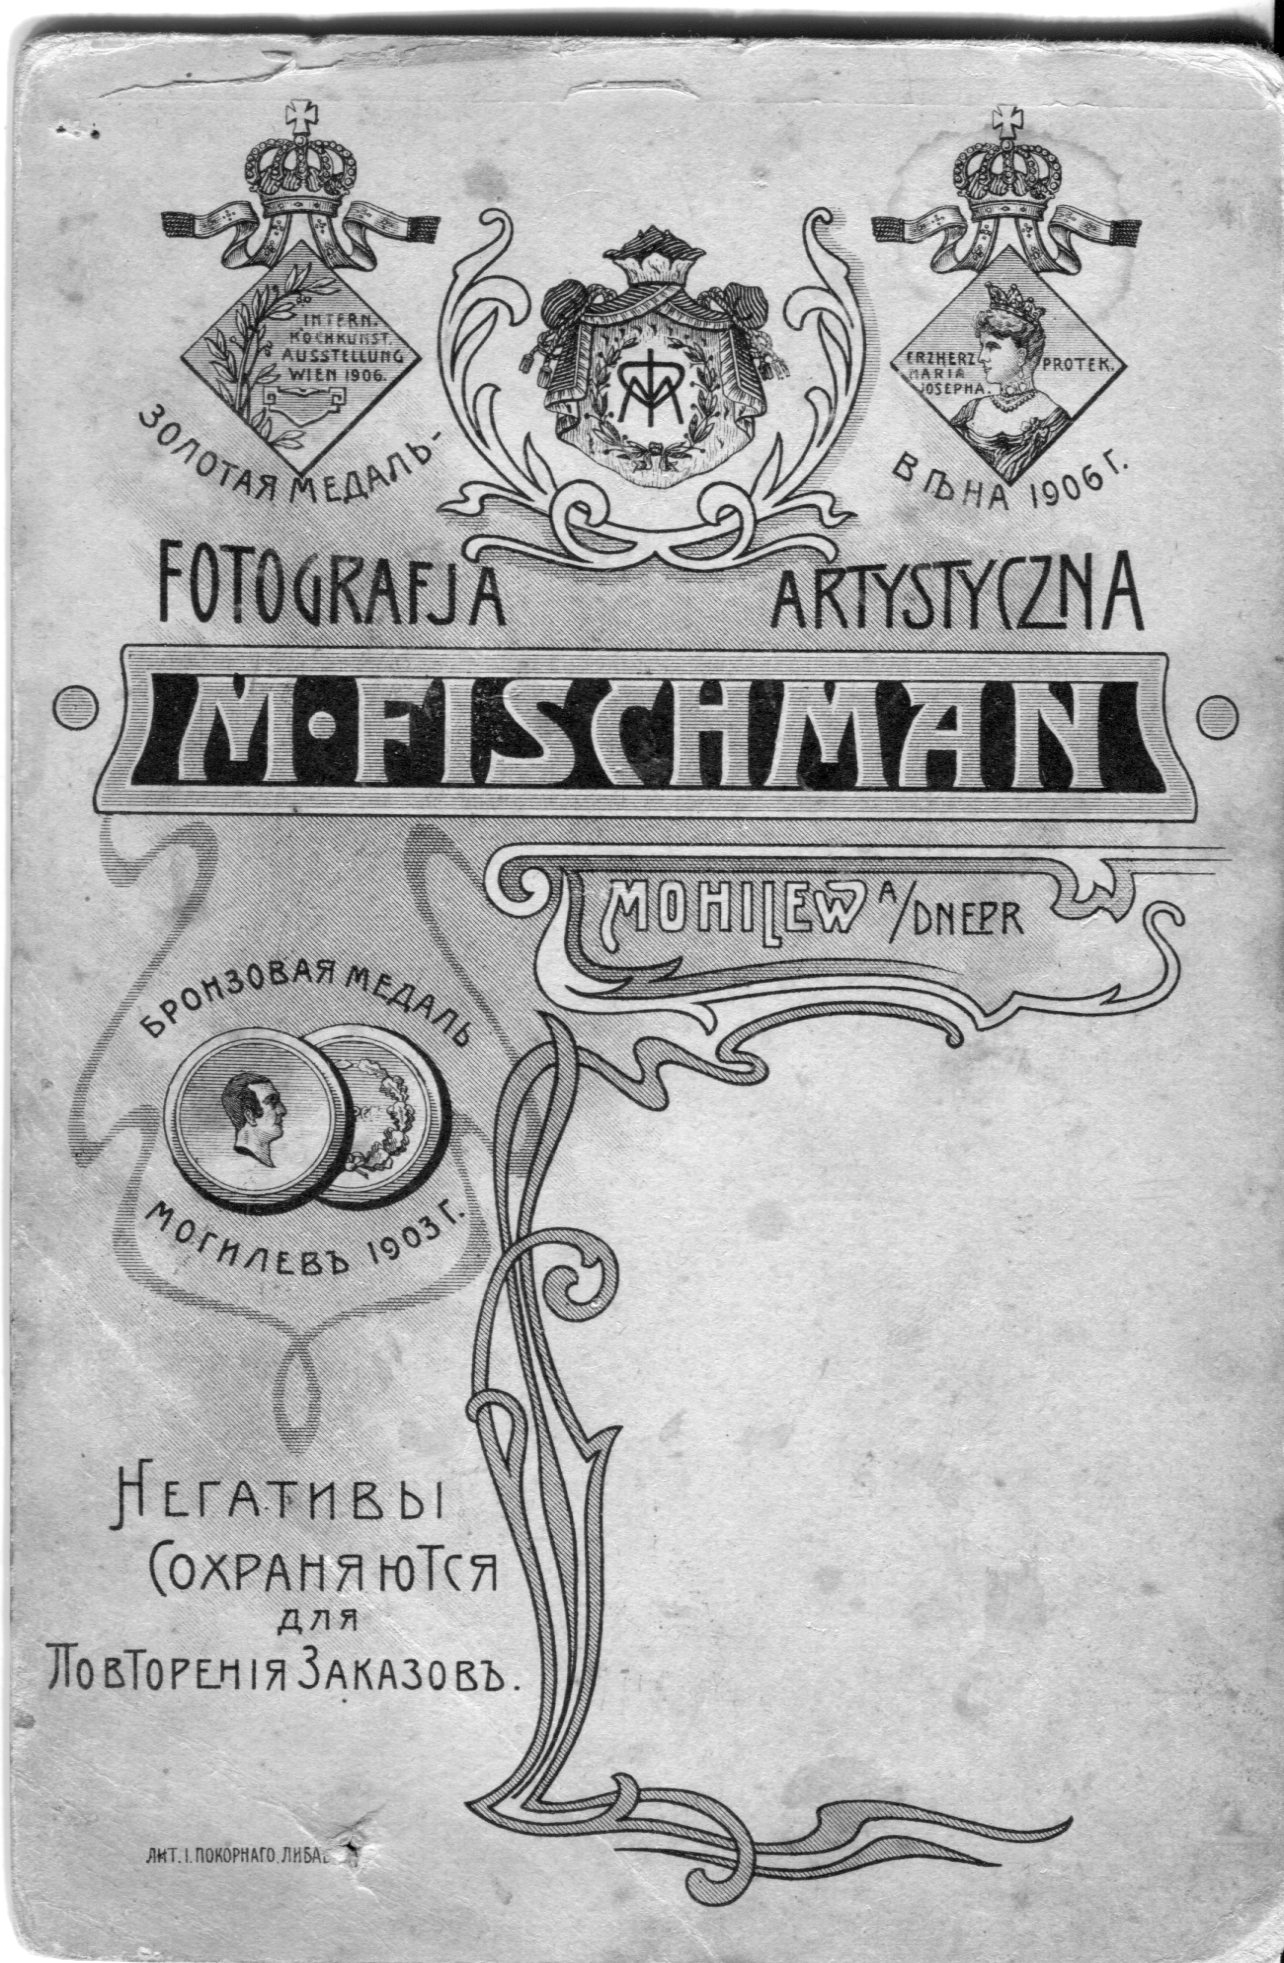 Meer, Shima, Shmuel stands, Sofia left, Etka middle 1906003